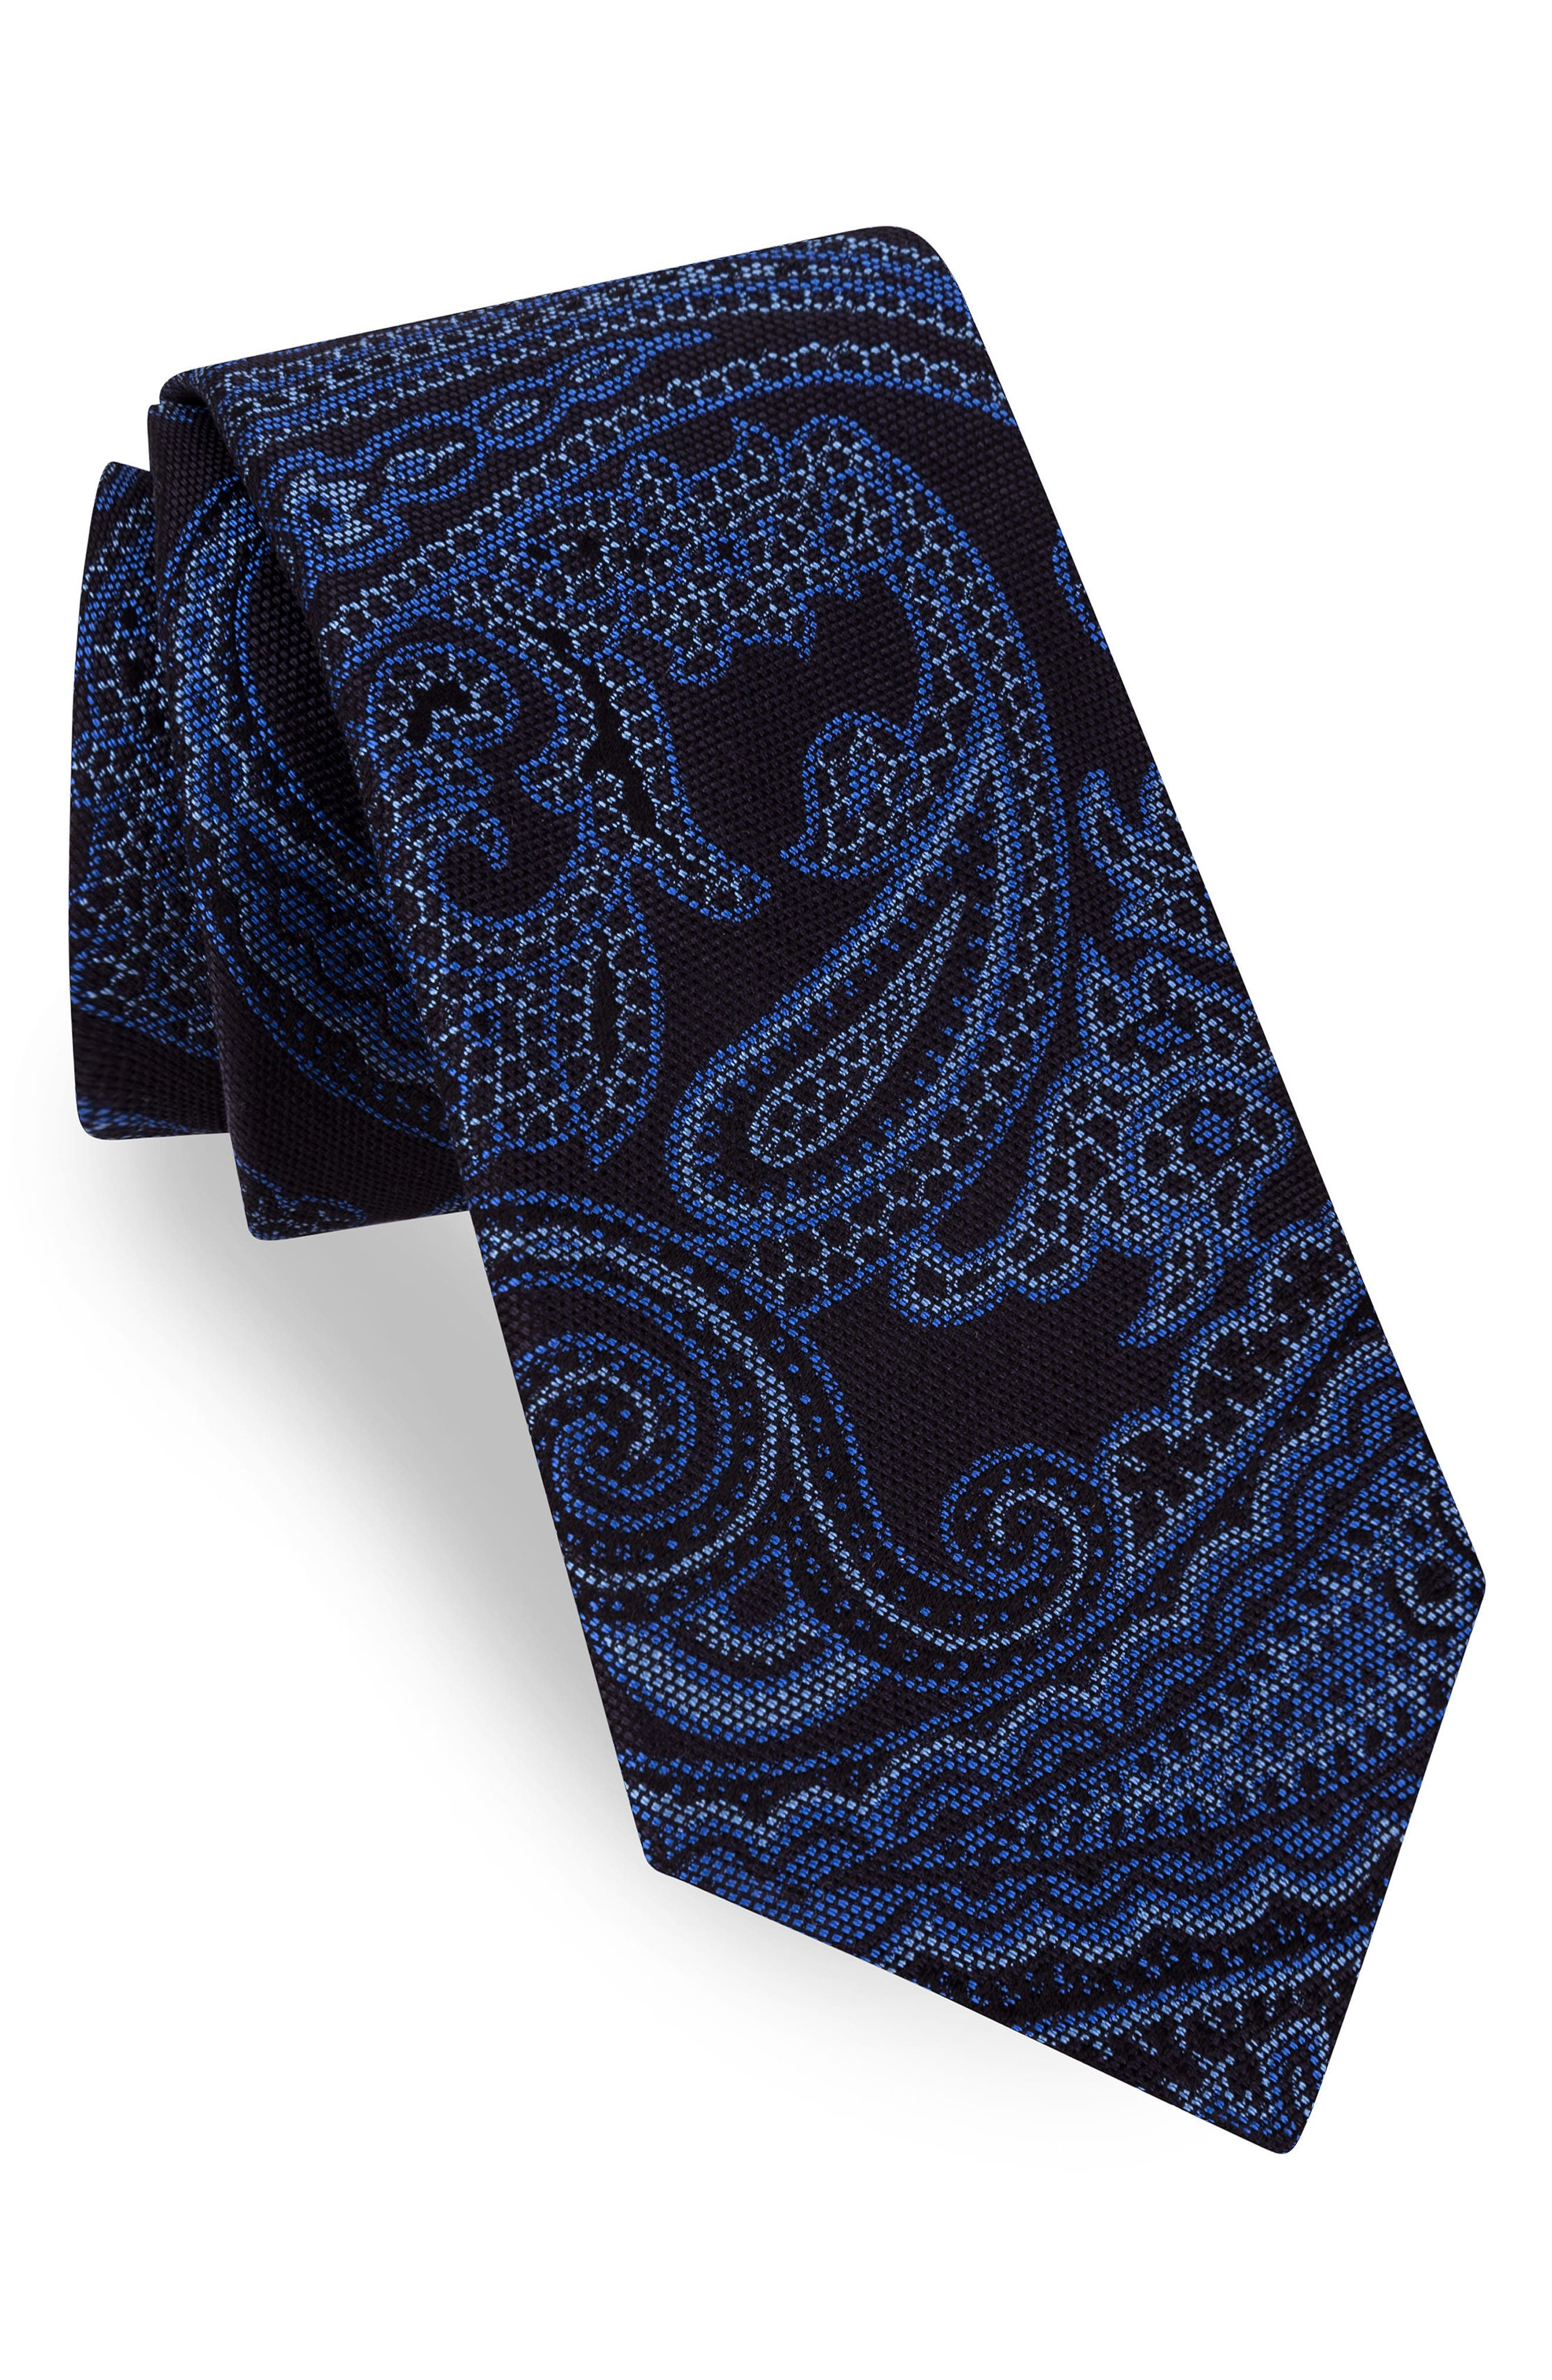 Peter Paisley Silk Tie,                         Main,                         color, 001